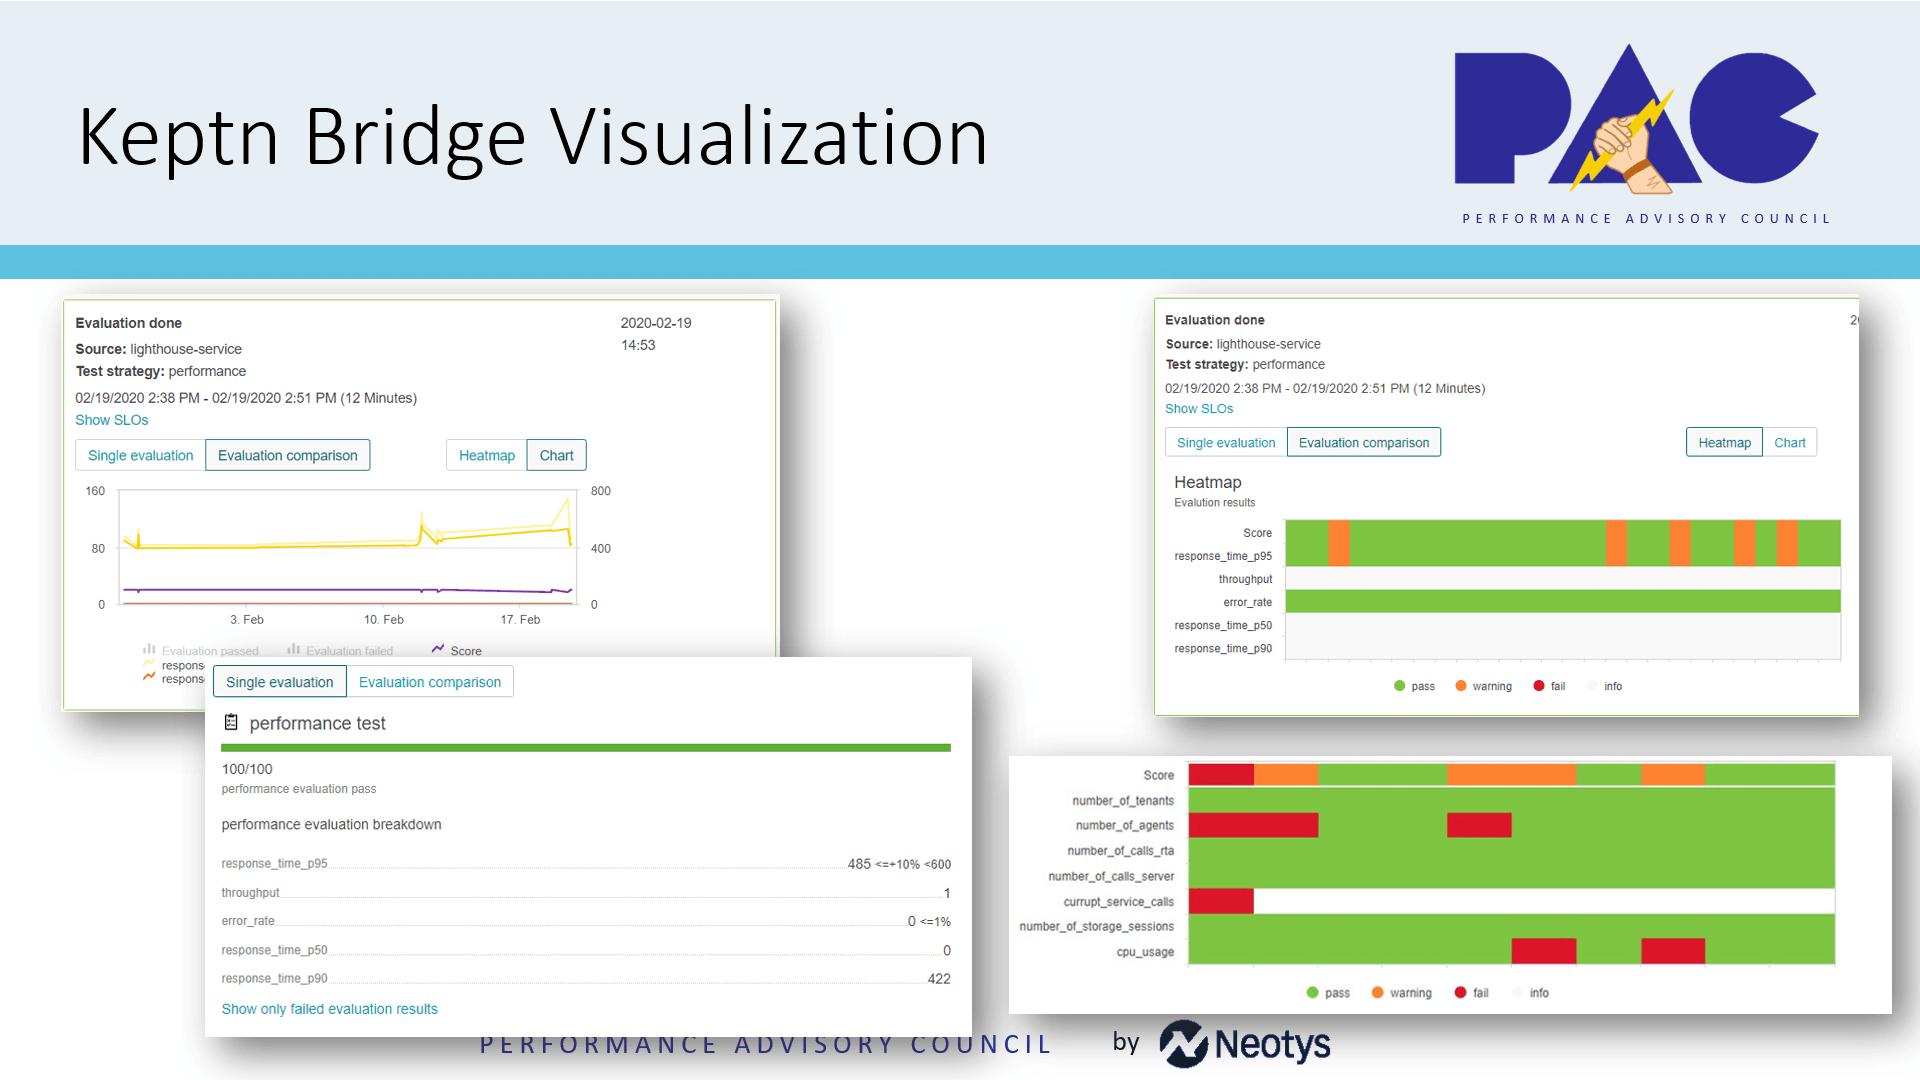 keptn bridge visualization